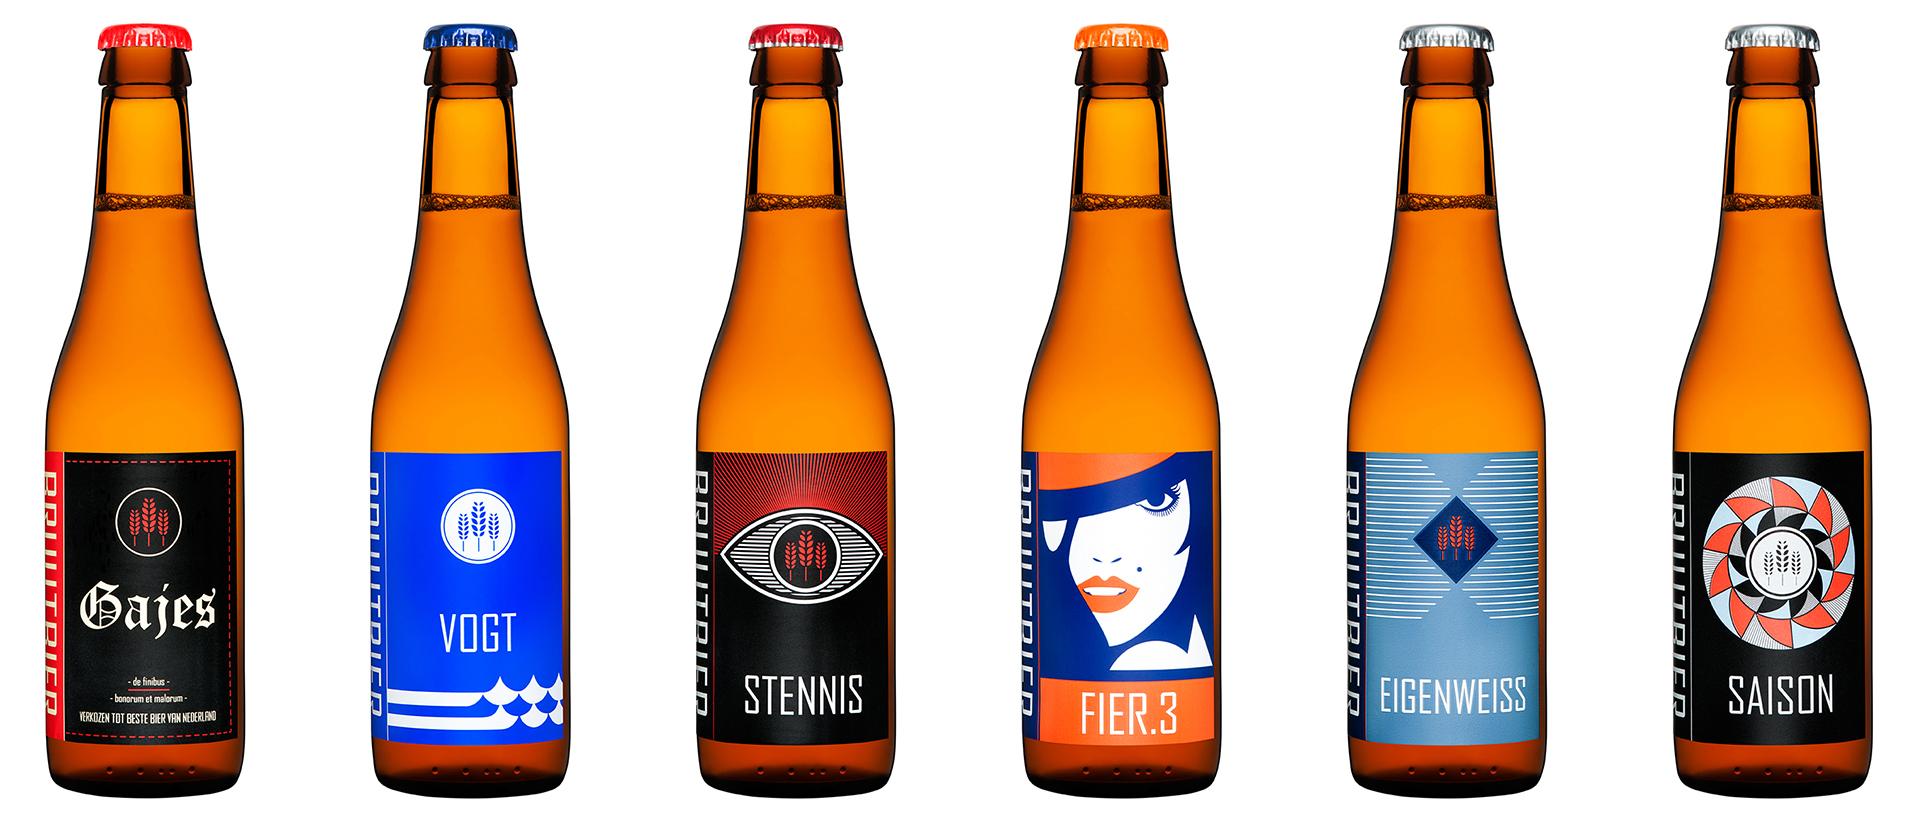 nectar-utrecht-pils-bier-brouwerij-nederland-streekbier-amsterdam-bruutbier-foto02